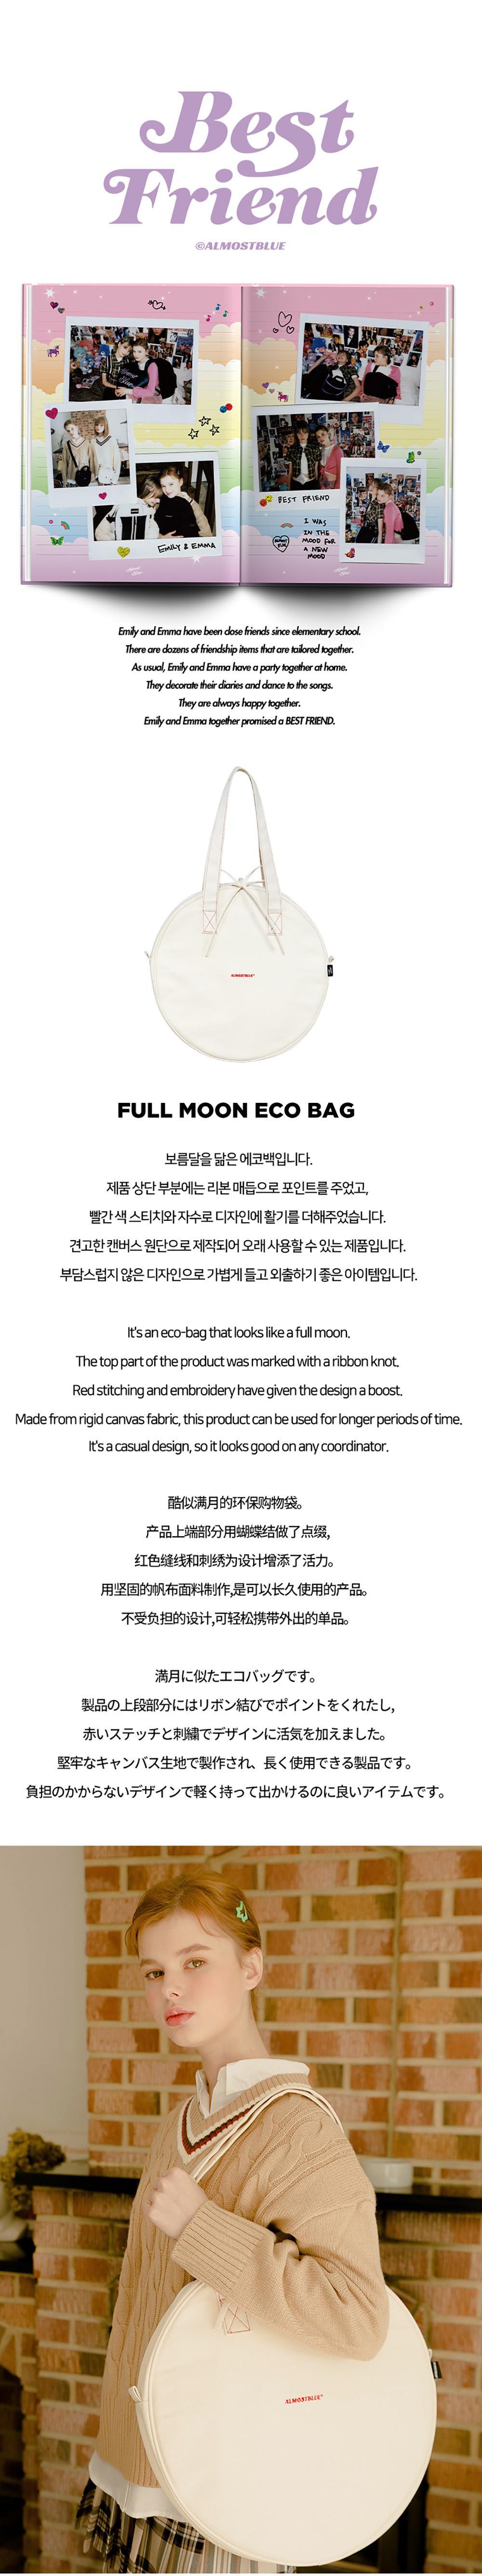 fullmoon eco bag 1.jpg